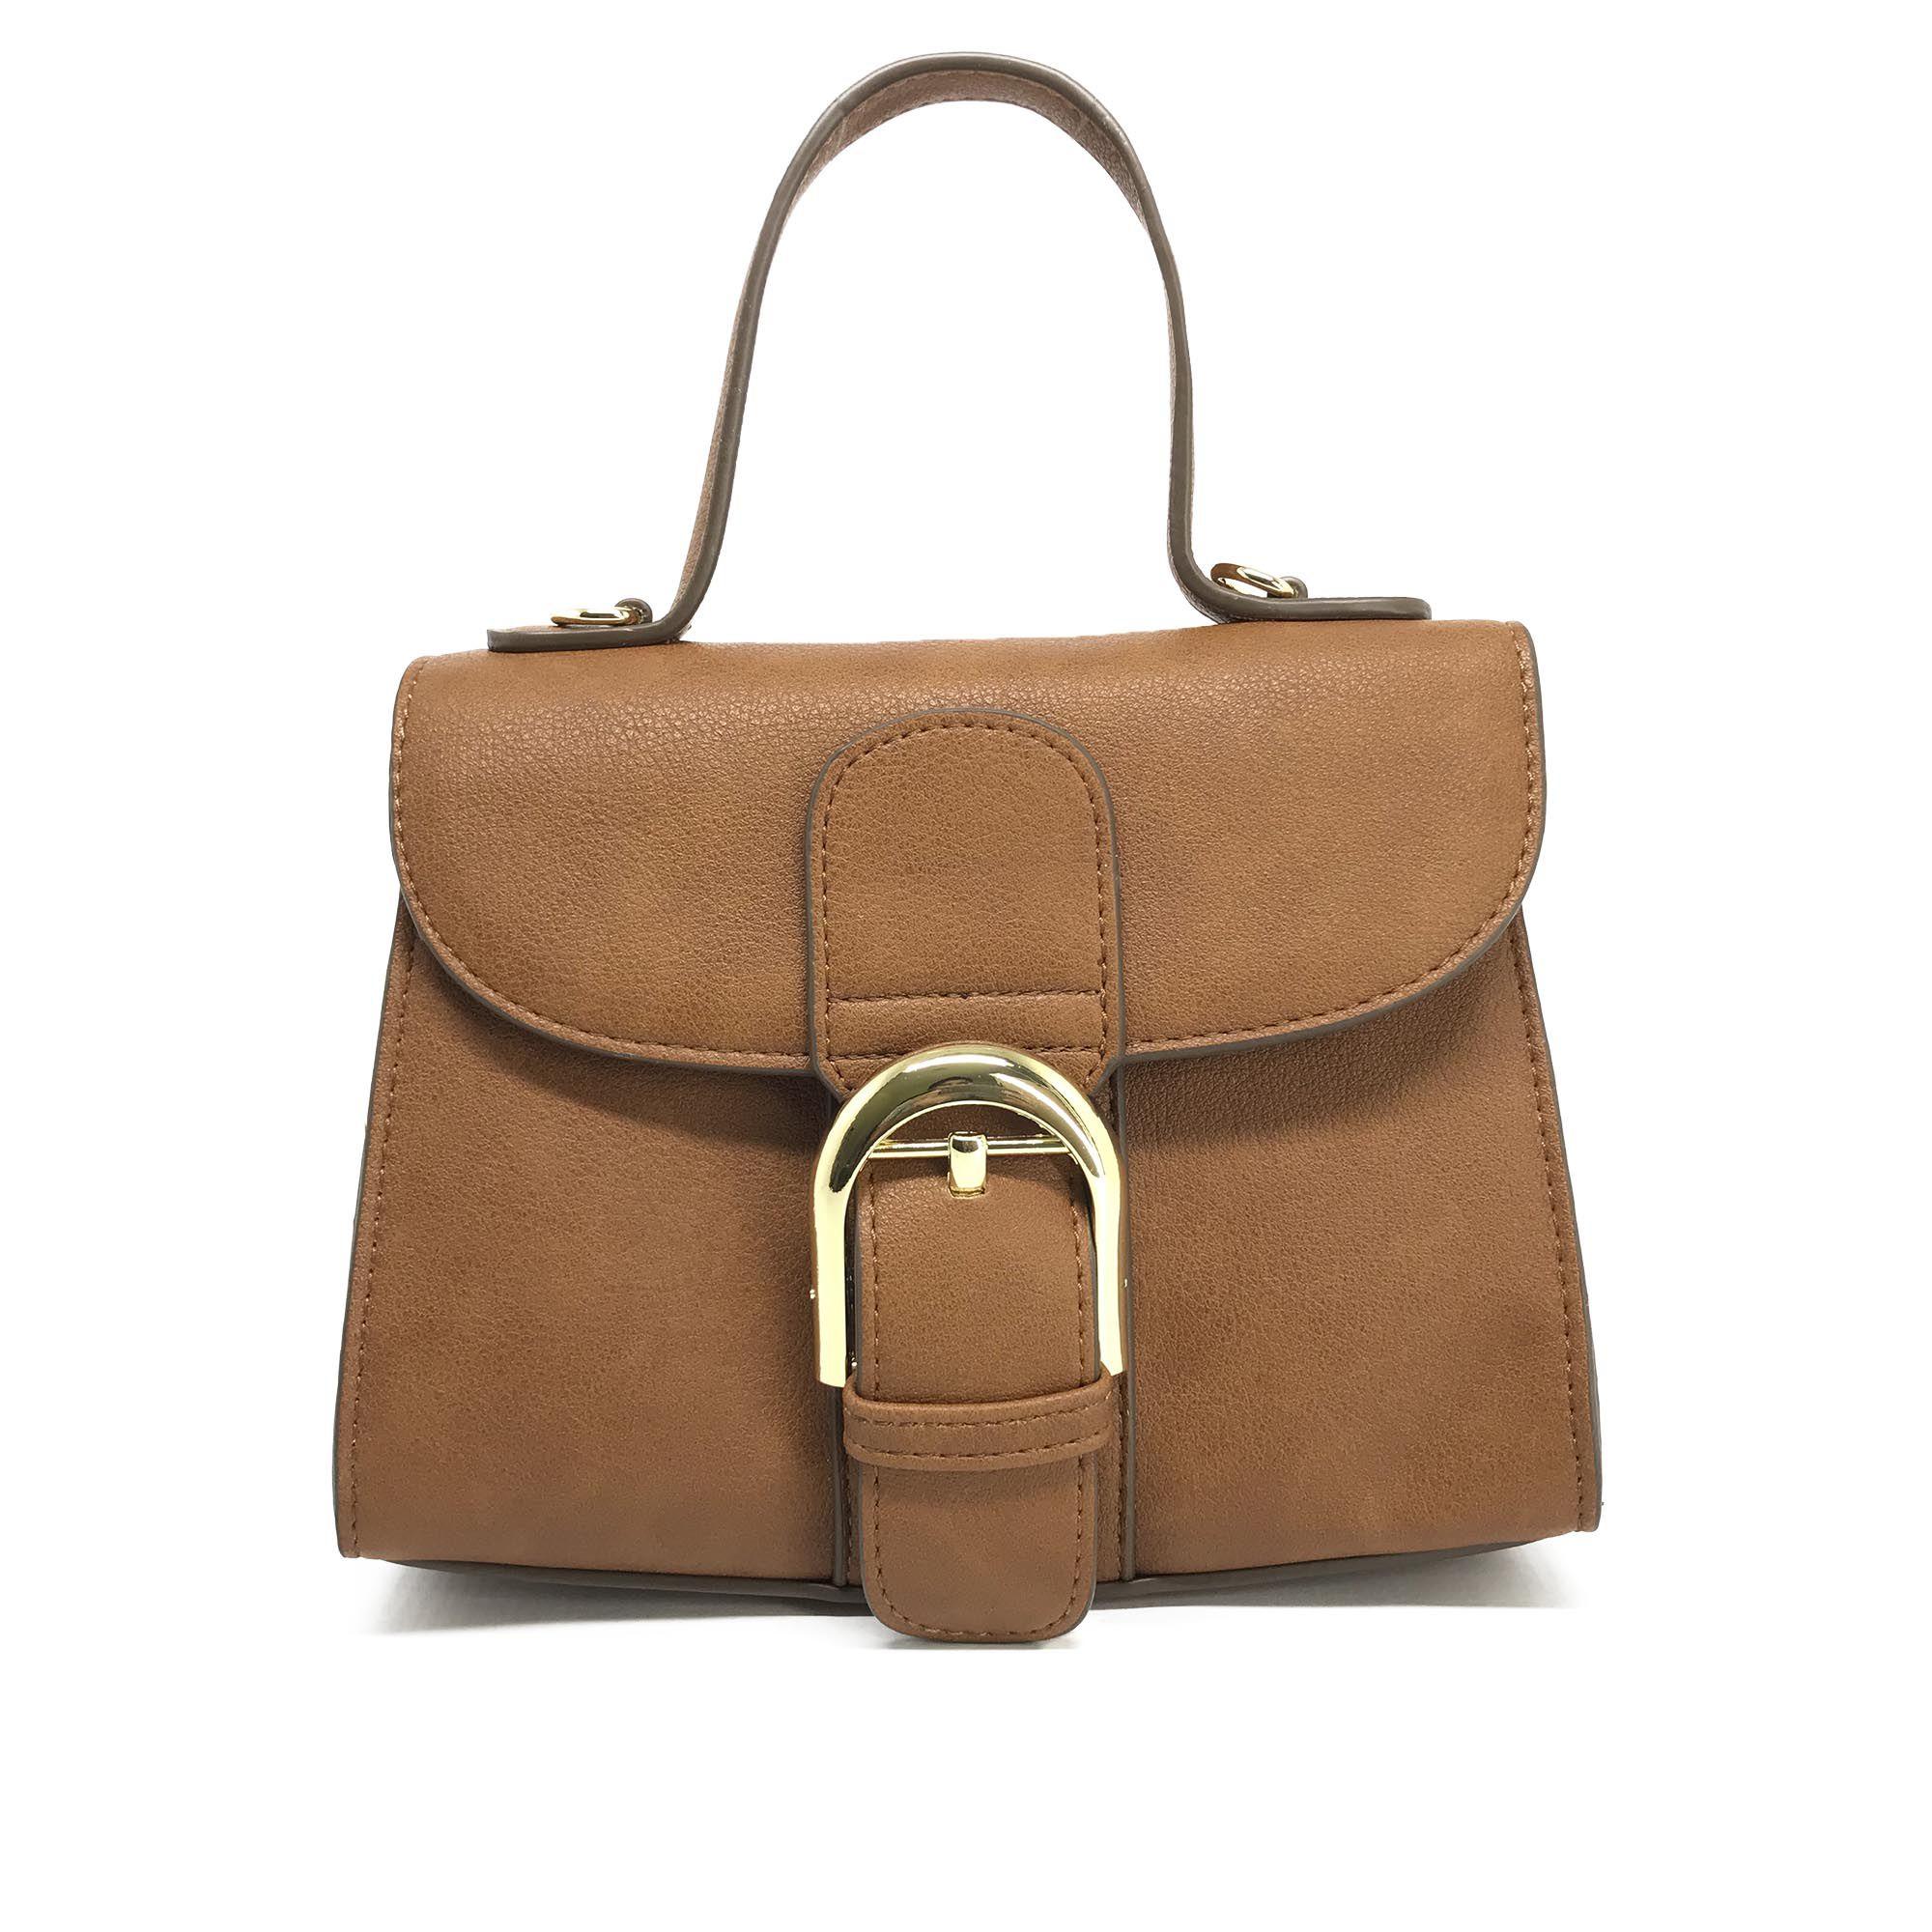 8d44469c0a Aymorez - Bolsa Transversal Mini Bag Caramelo AY063-6